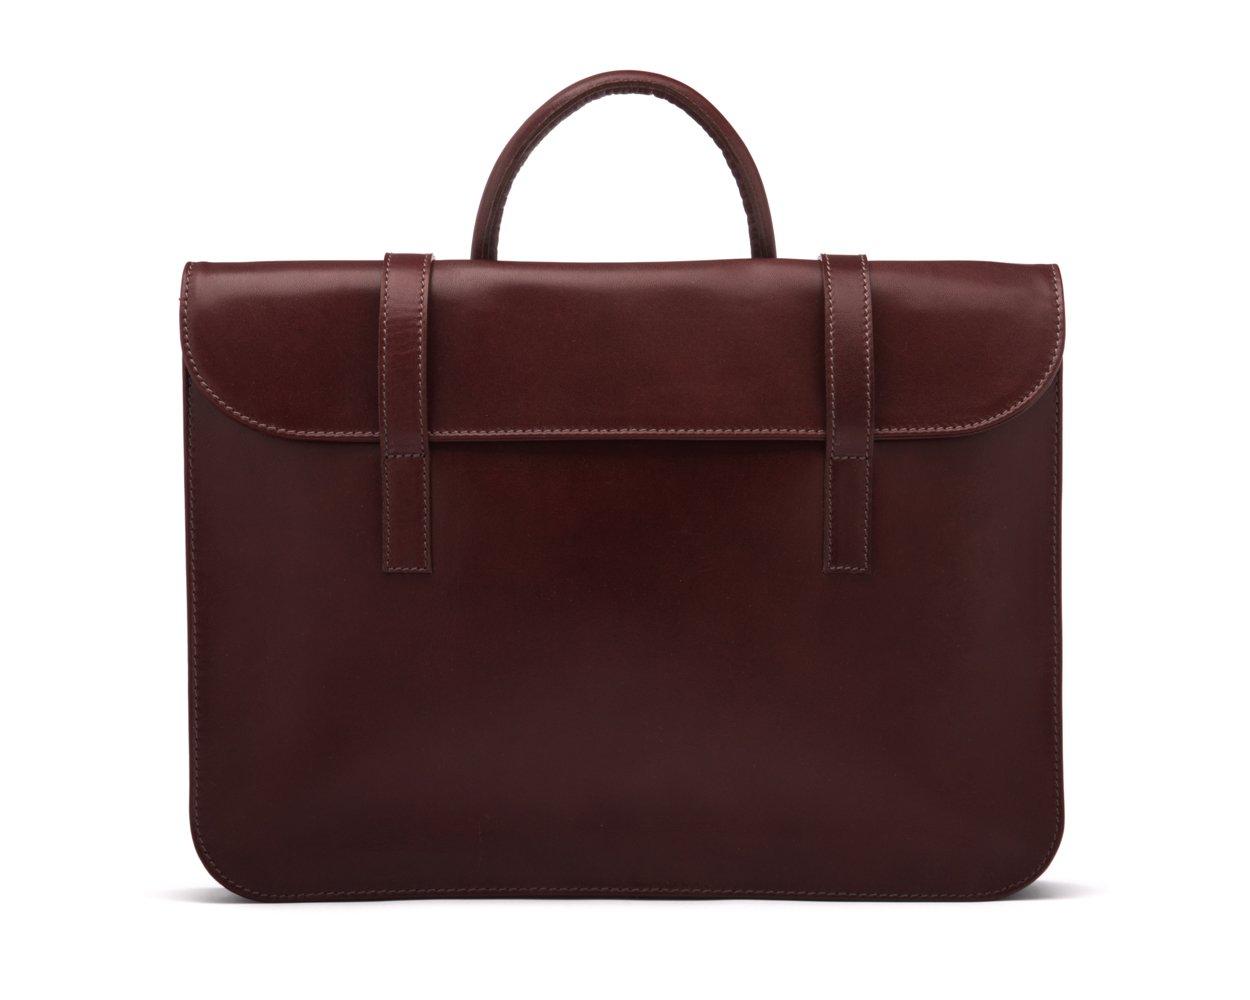 SAGEBROWN Dark Tan Luxury Leather Music Bag